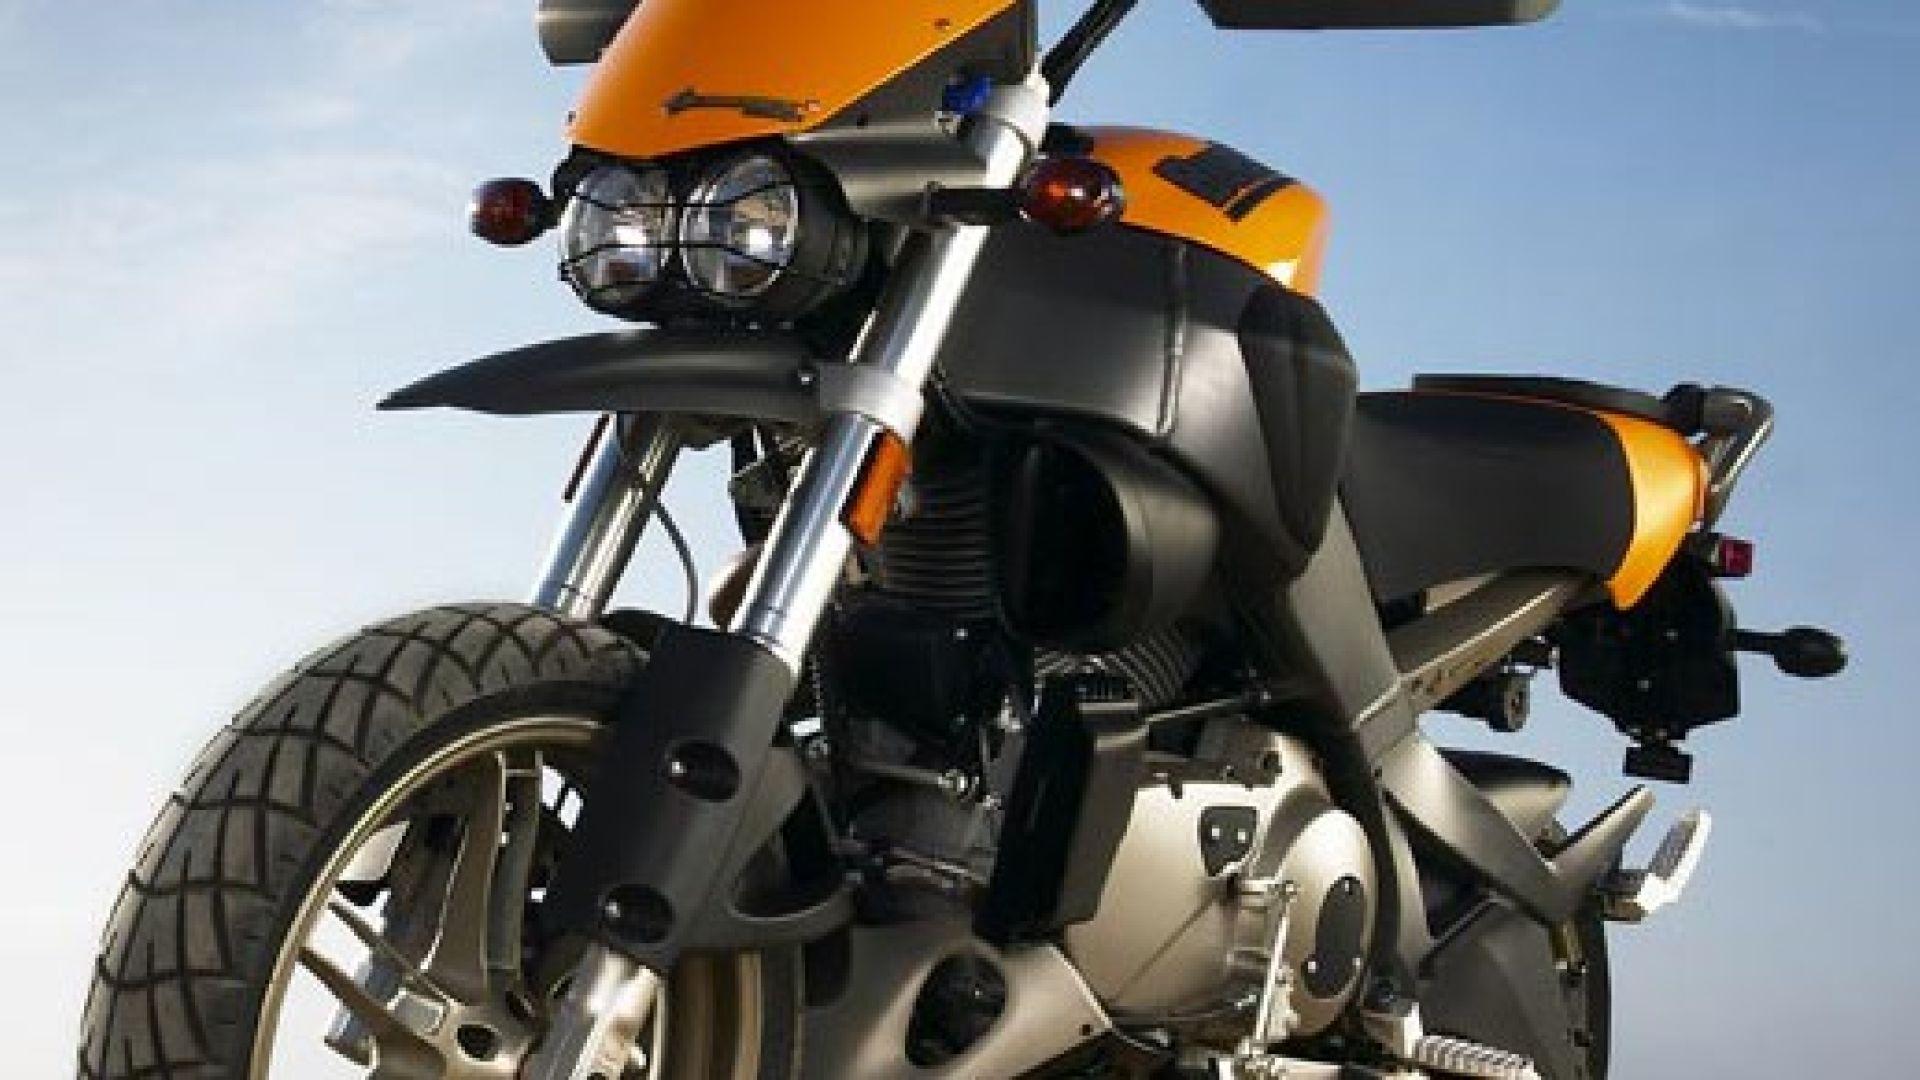 anteprima:: buell xb12 ulysses - motorbox